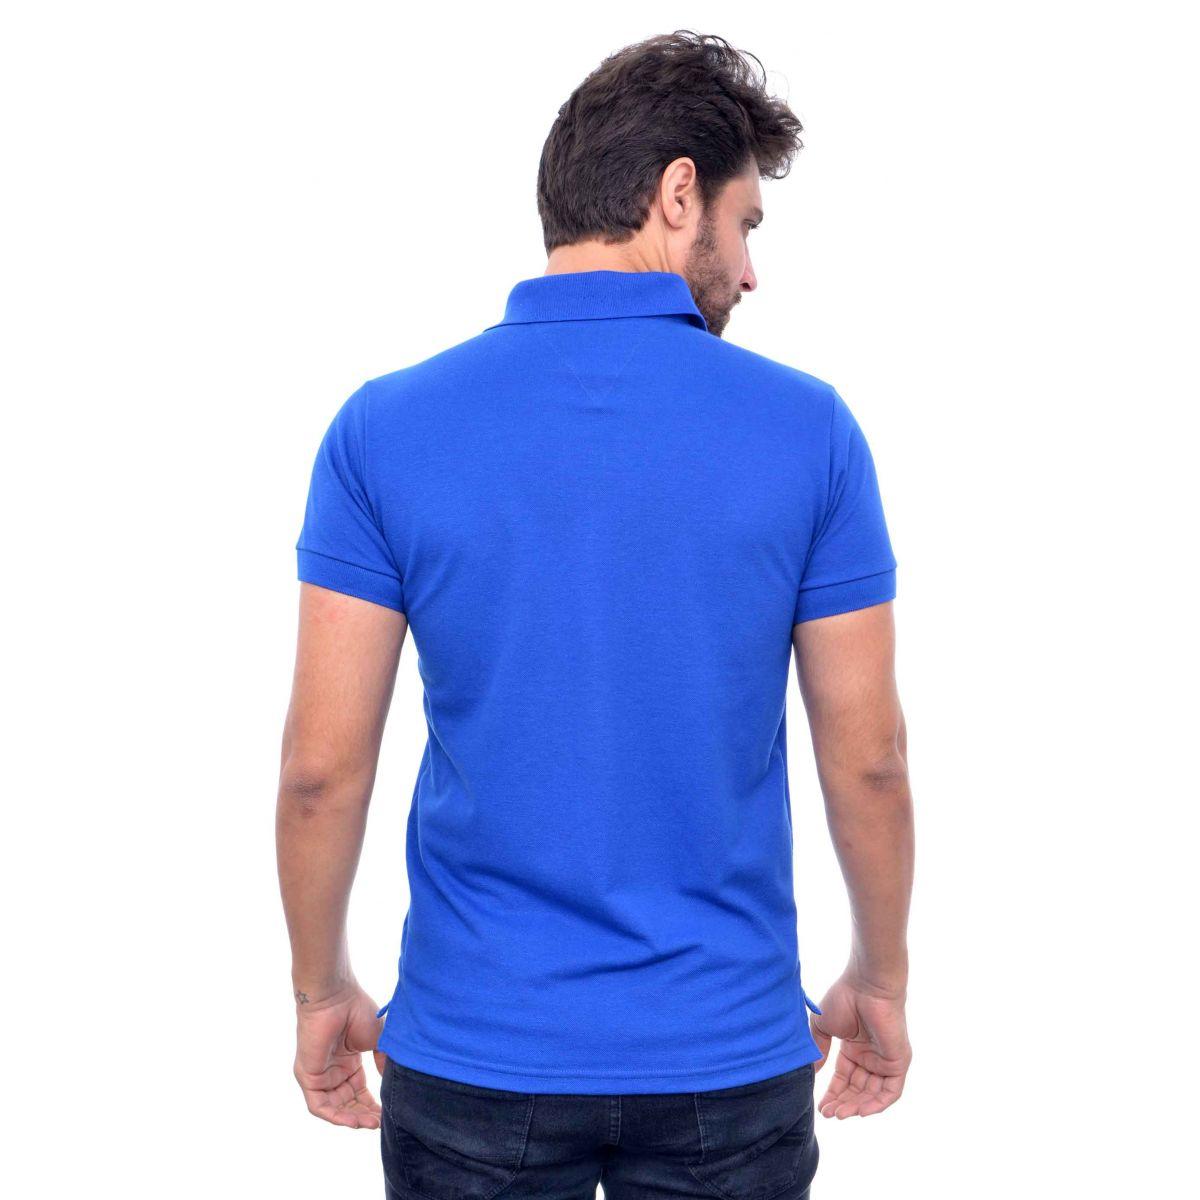 Polo Tommy Hilfiger Azul Royal  - Ca Brasileira